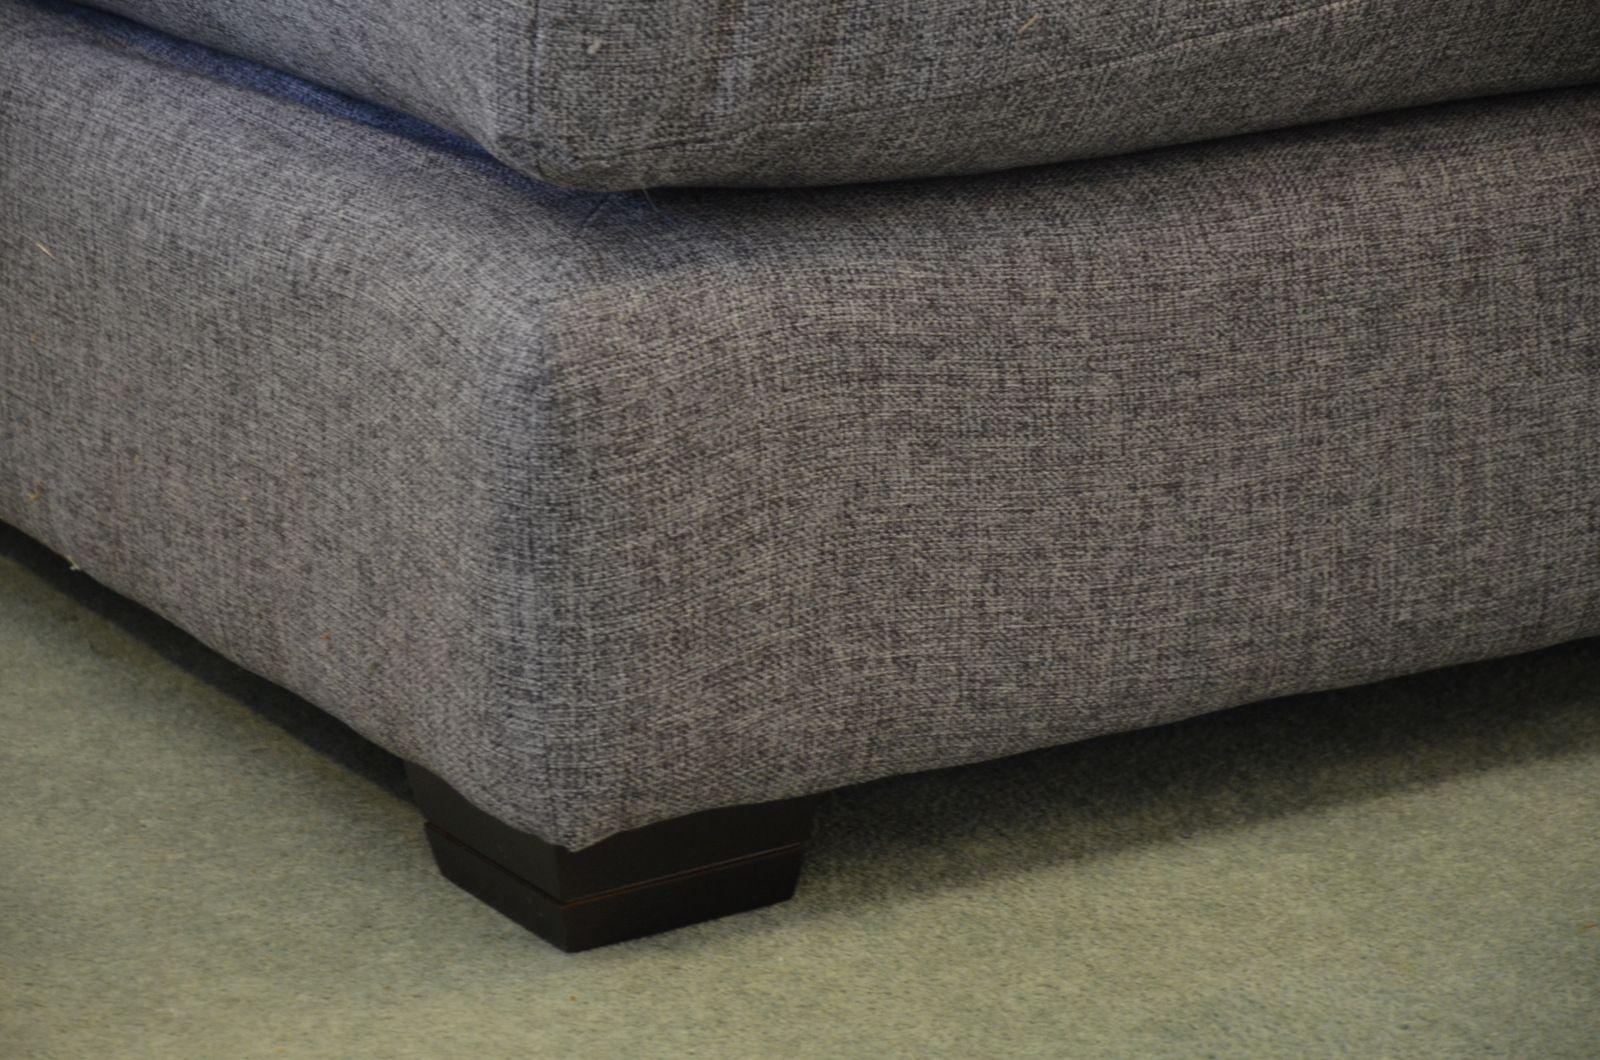 Groove Four Piece Corner Sofa In Indigo Blue Leather